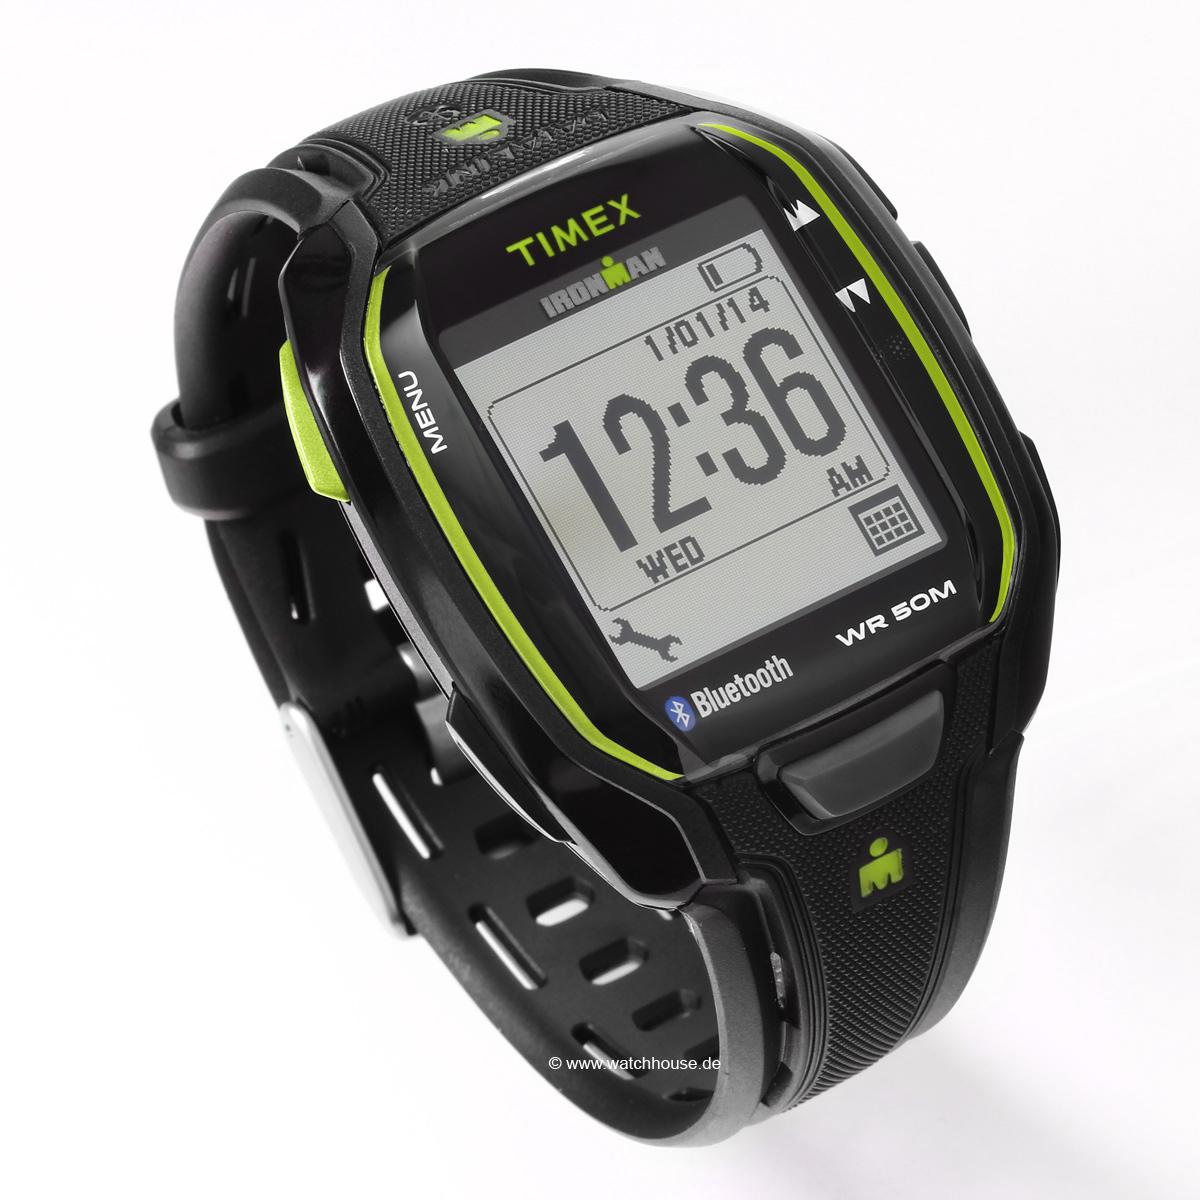 Timex Ironman Run x50 Sportchronograph TW5K88000 Smart Watch